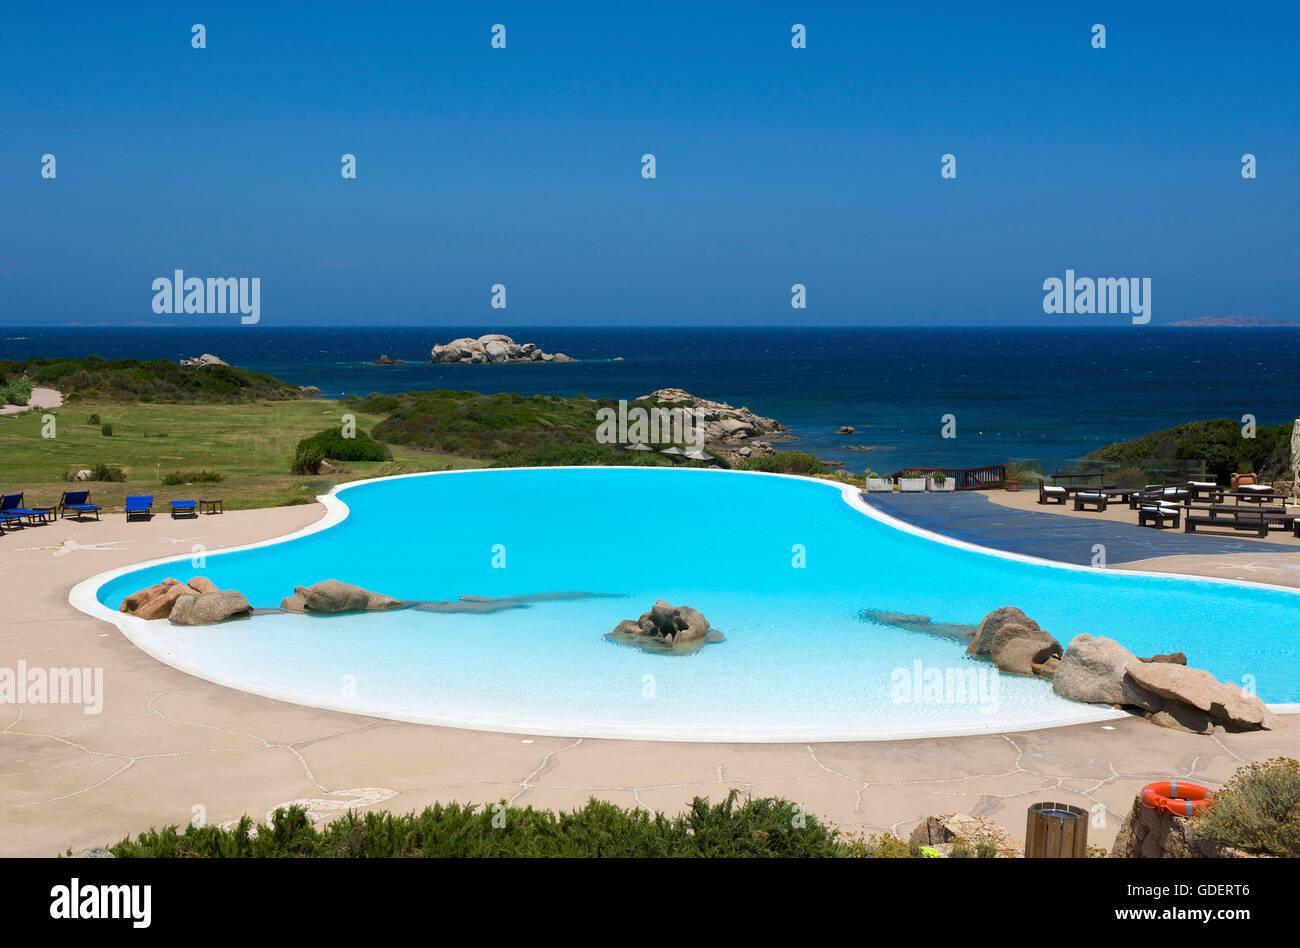 Valle dell Erica Hotel nearSanta Teresa Gallura, Sardinia, Italy - Stock Image